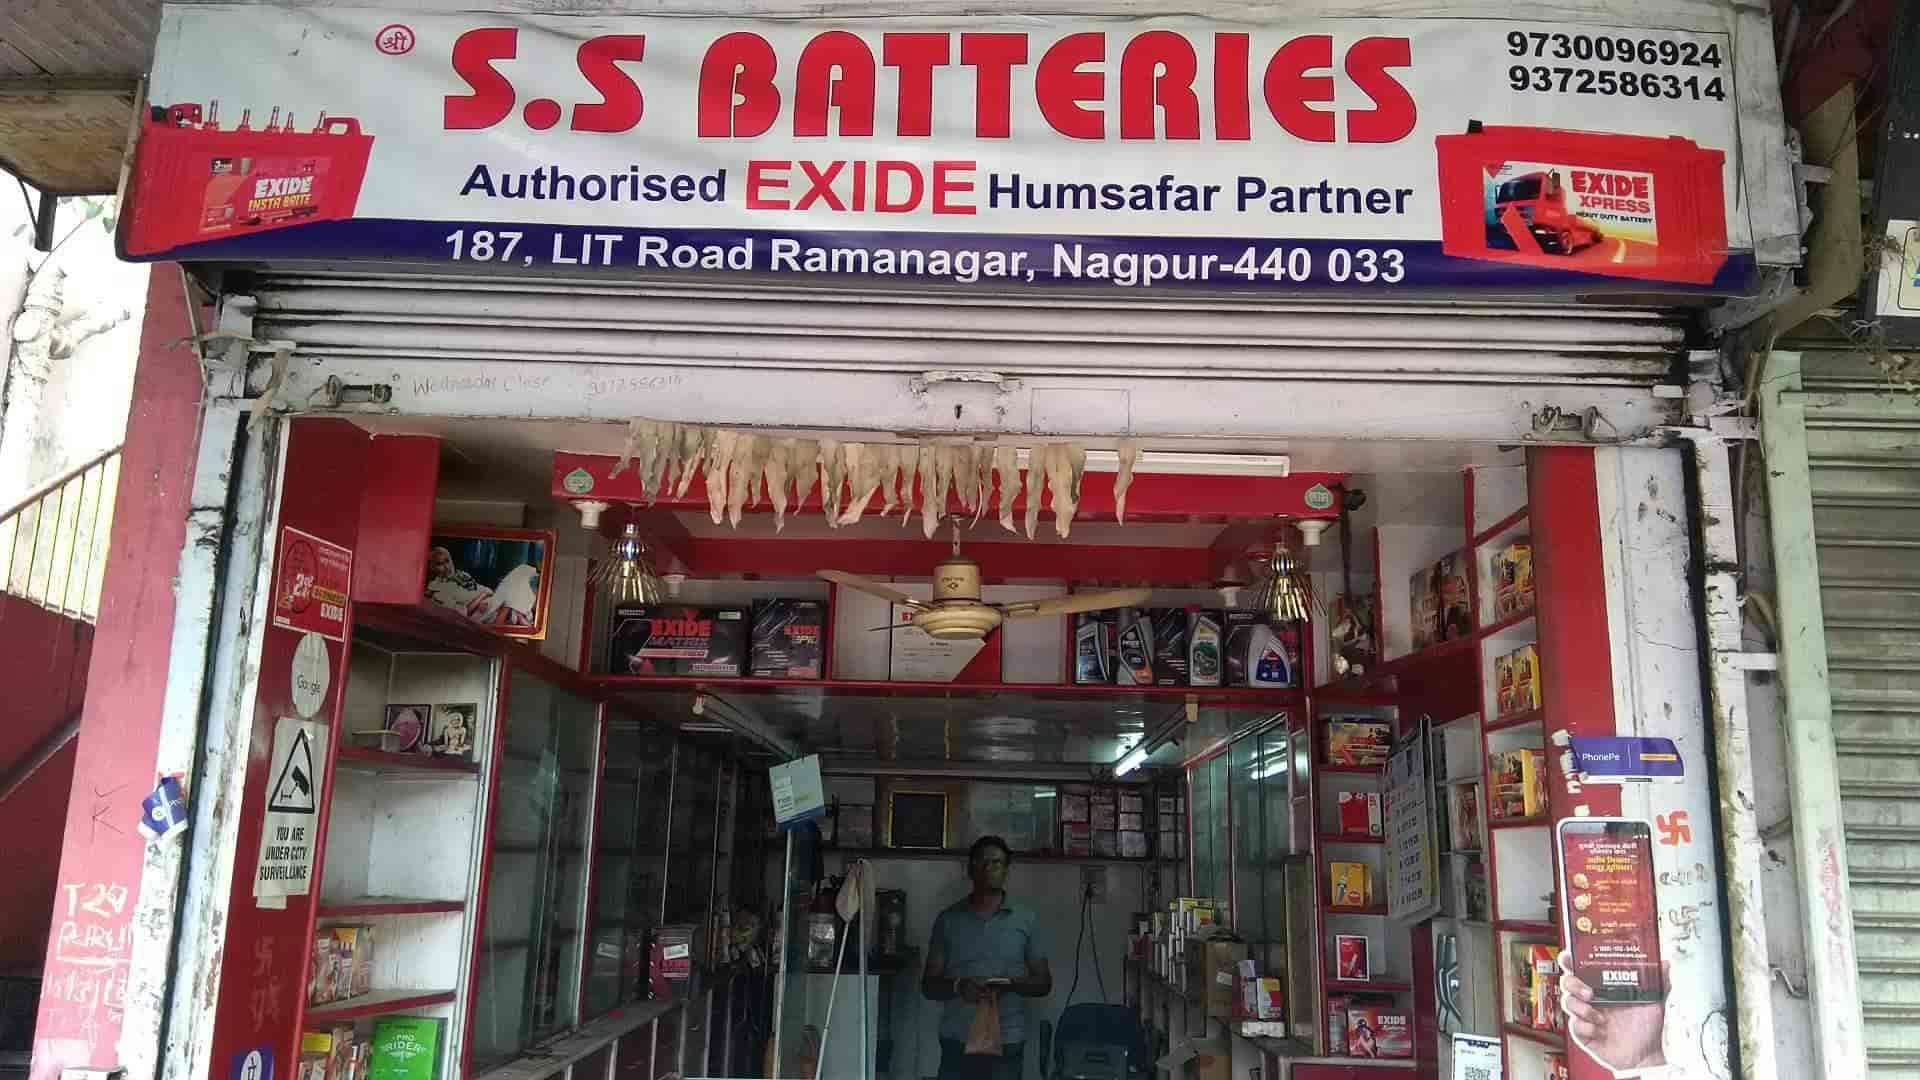 S S Batteries, Ramnagar - Battery Dealers in Nagpur, Nagpur